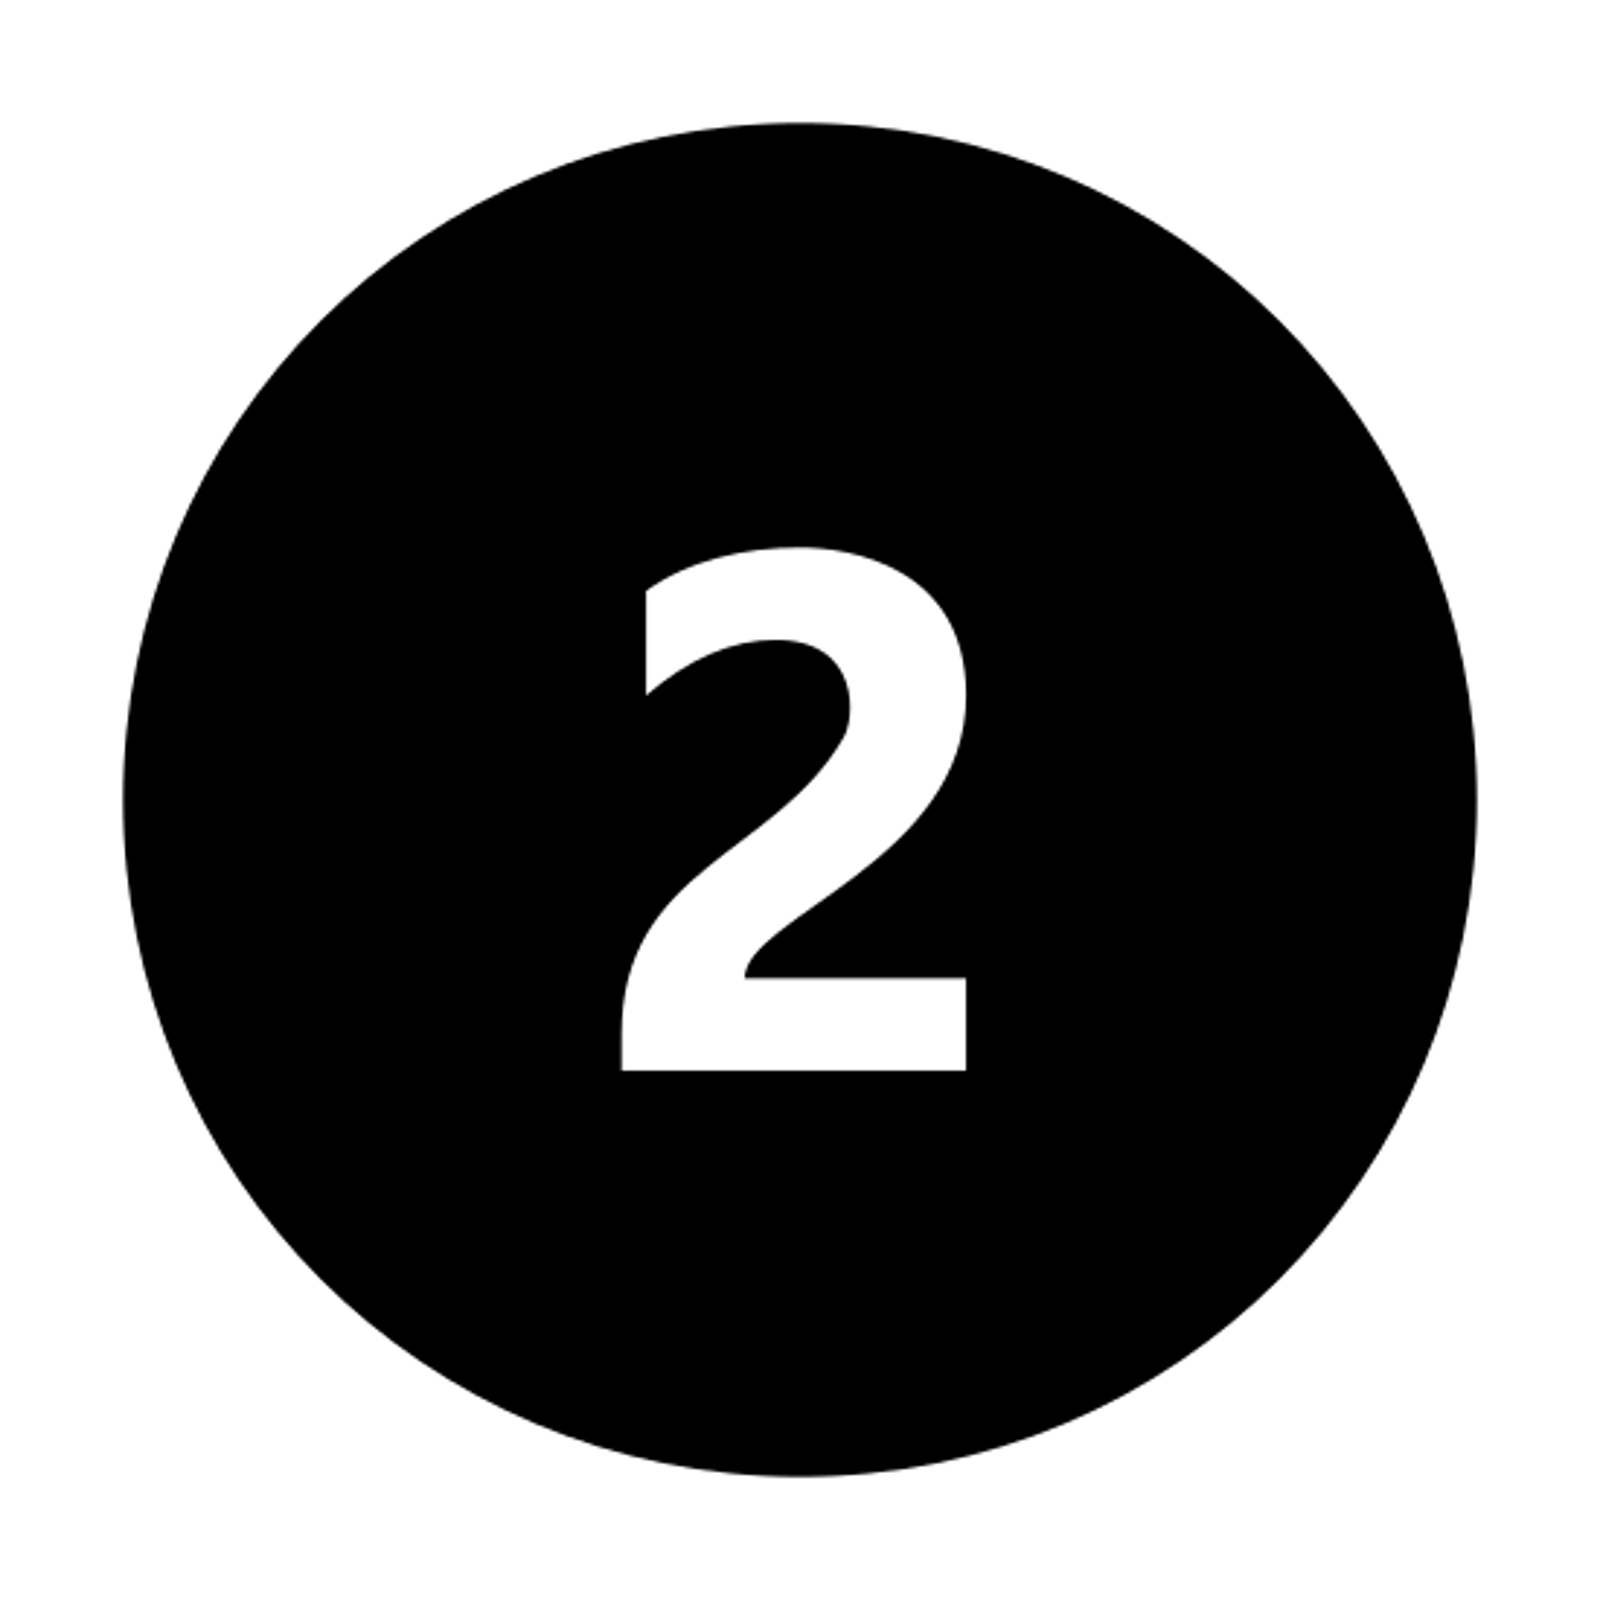 2 circulado C icon